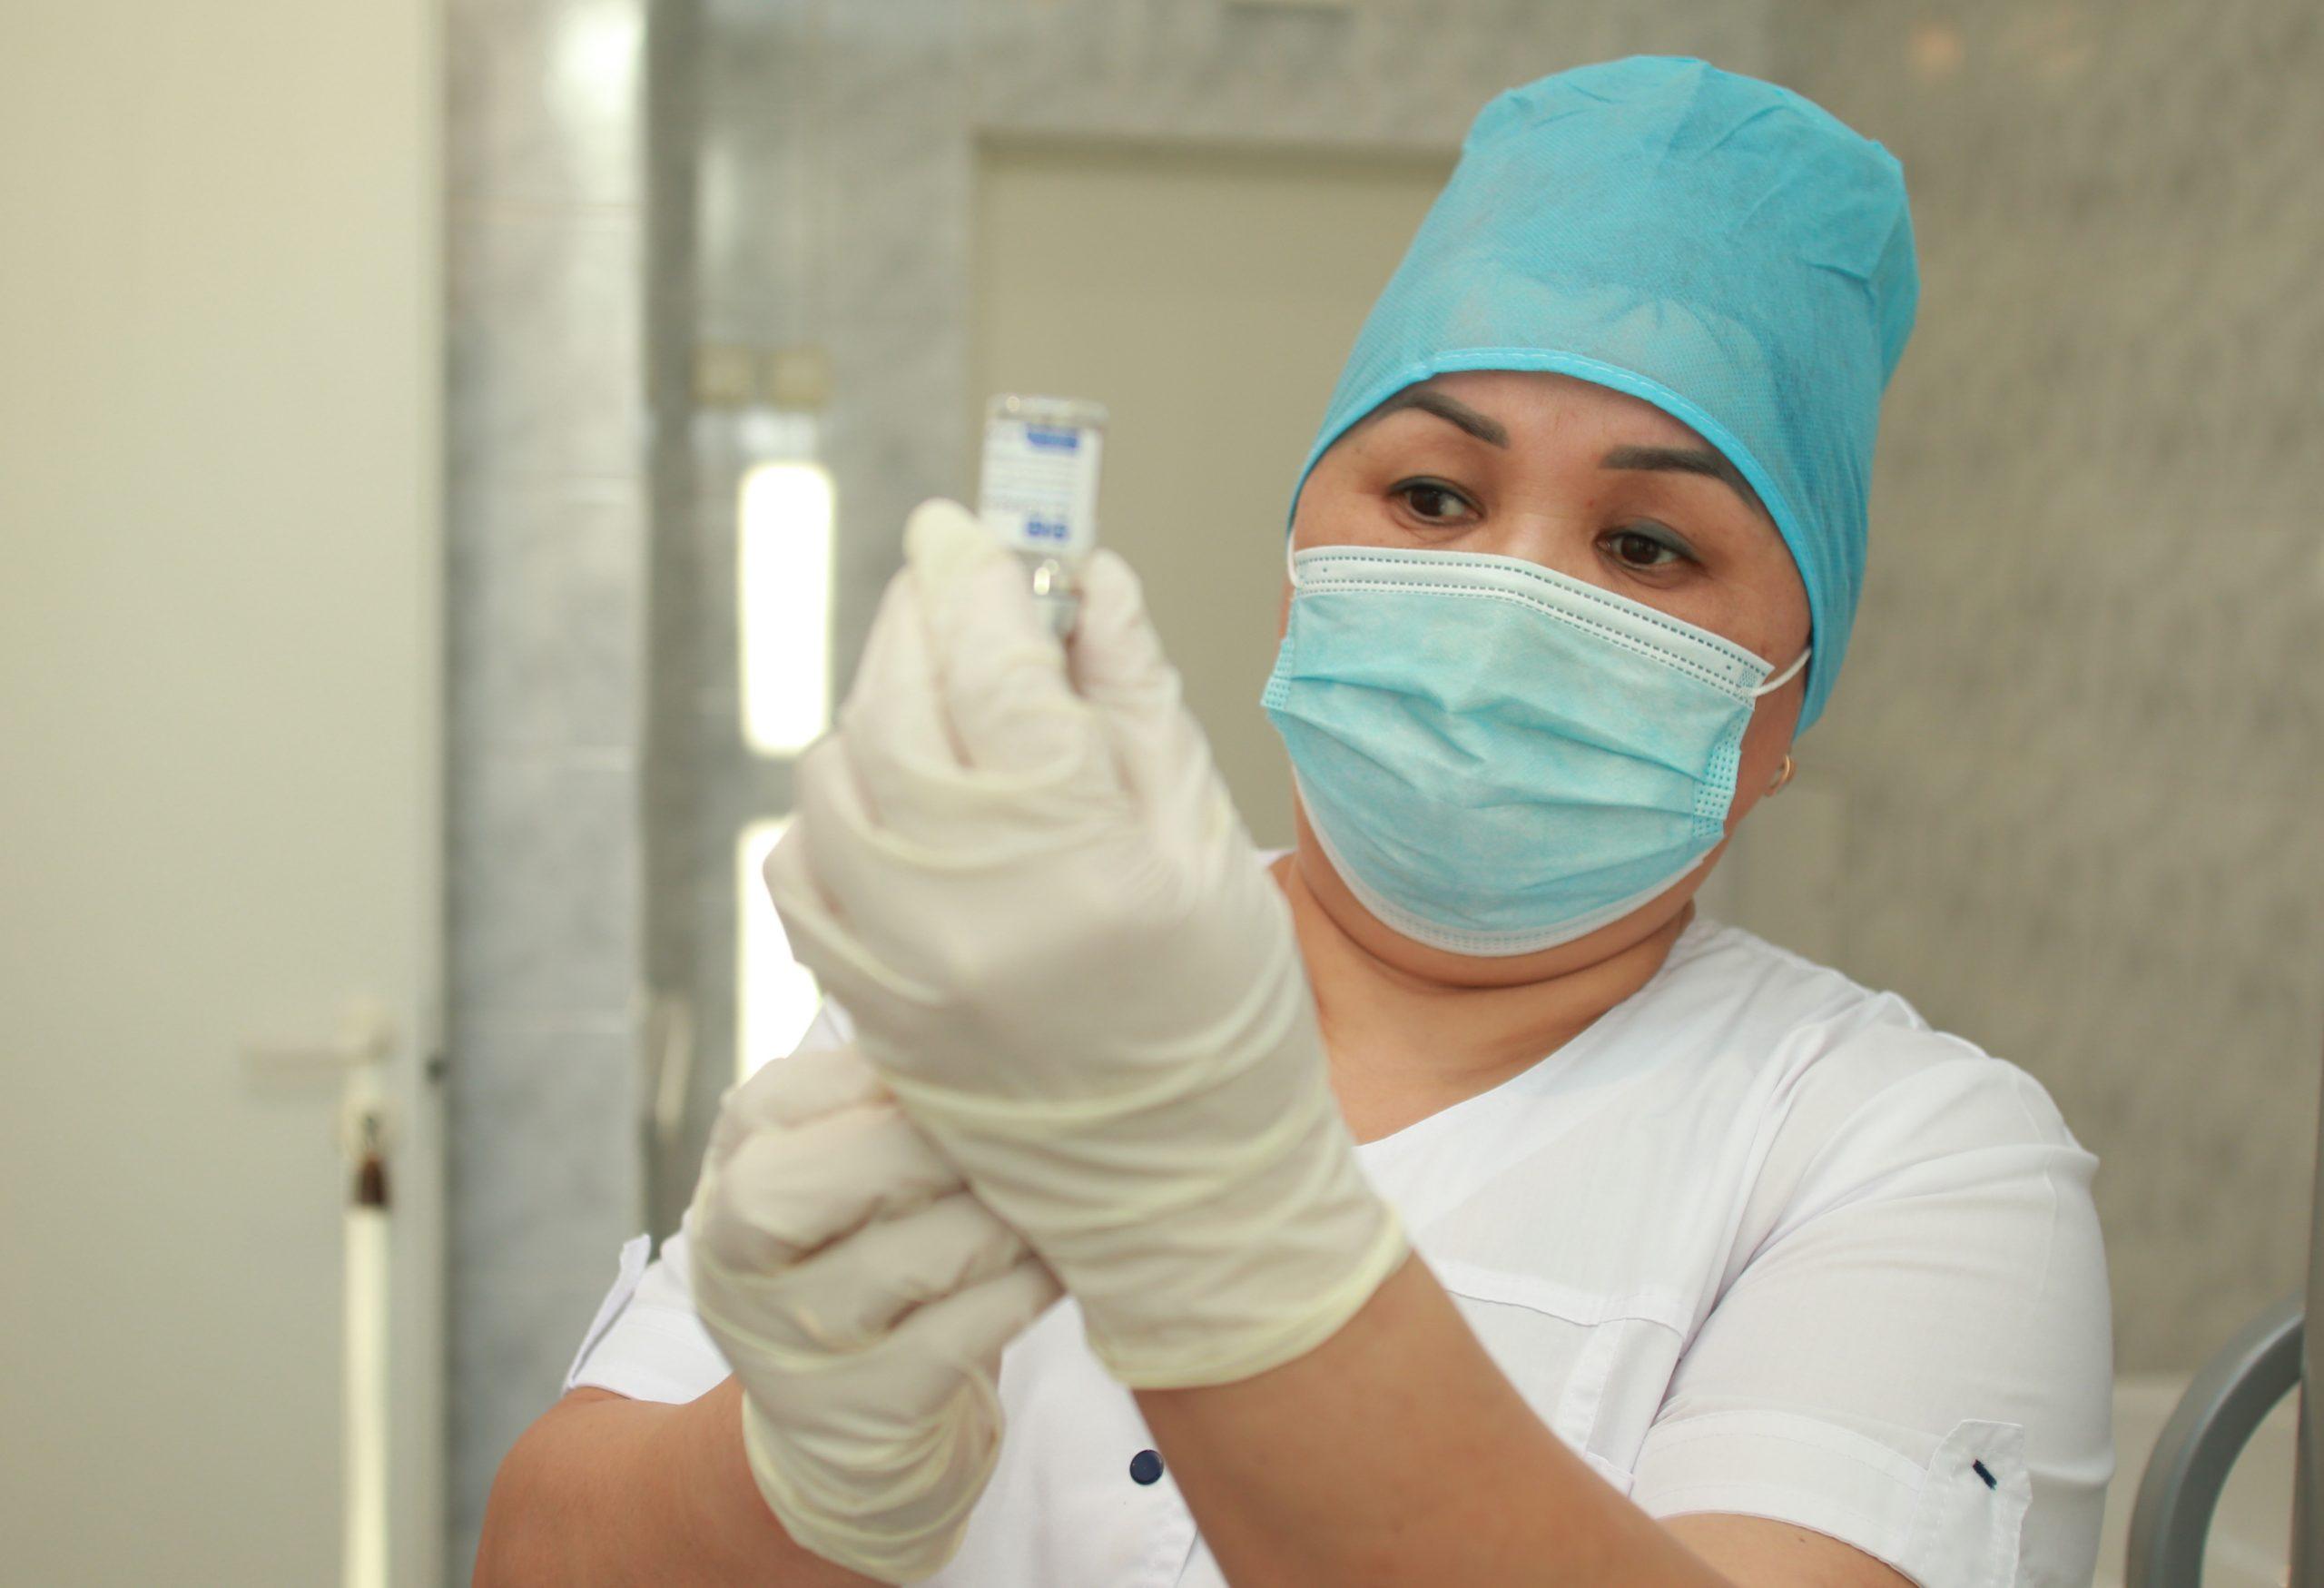 Российская вакцина от COVID-19 заняла лидирующую позицию в мировом рейтинге. Фото: Фото: Наталия Нечаева, «Вечерняя Москва»